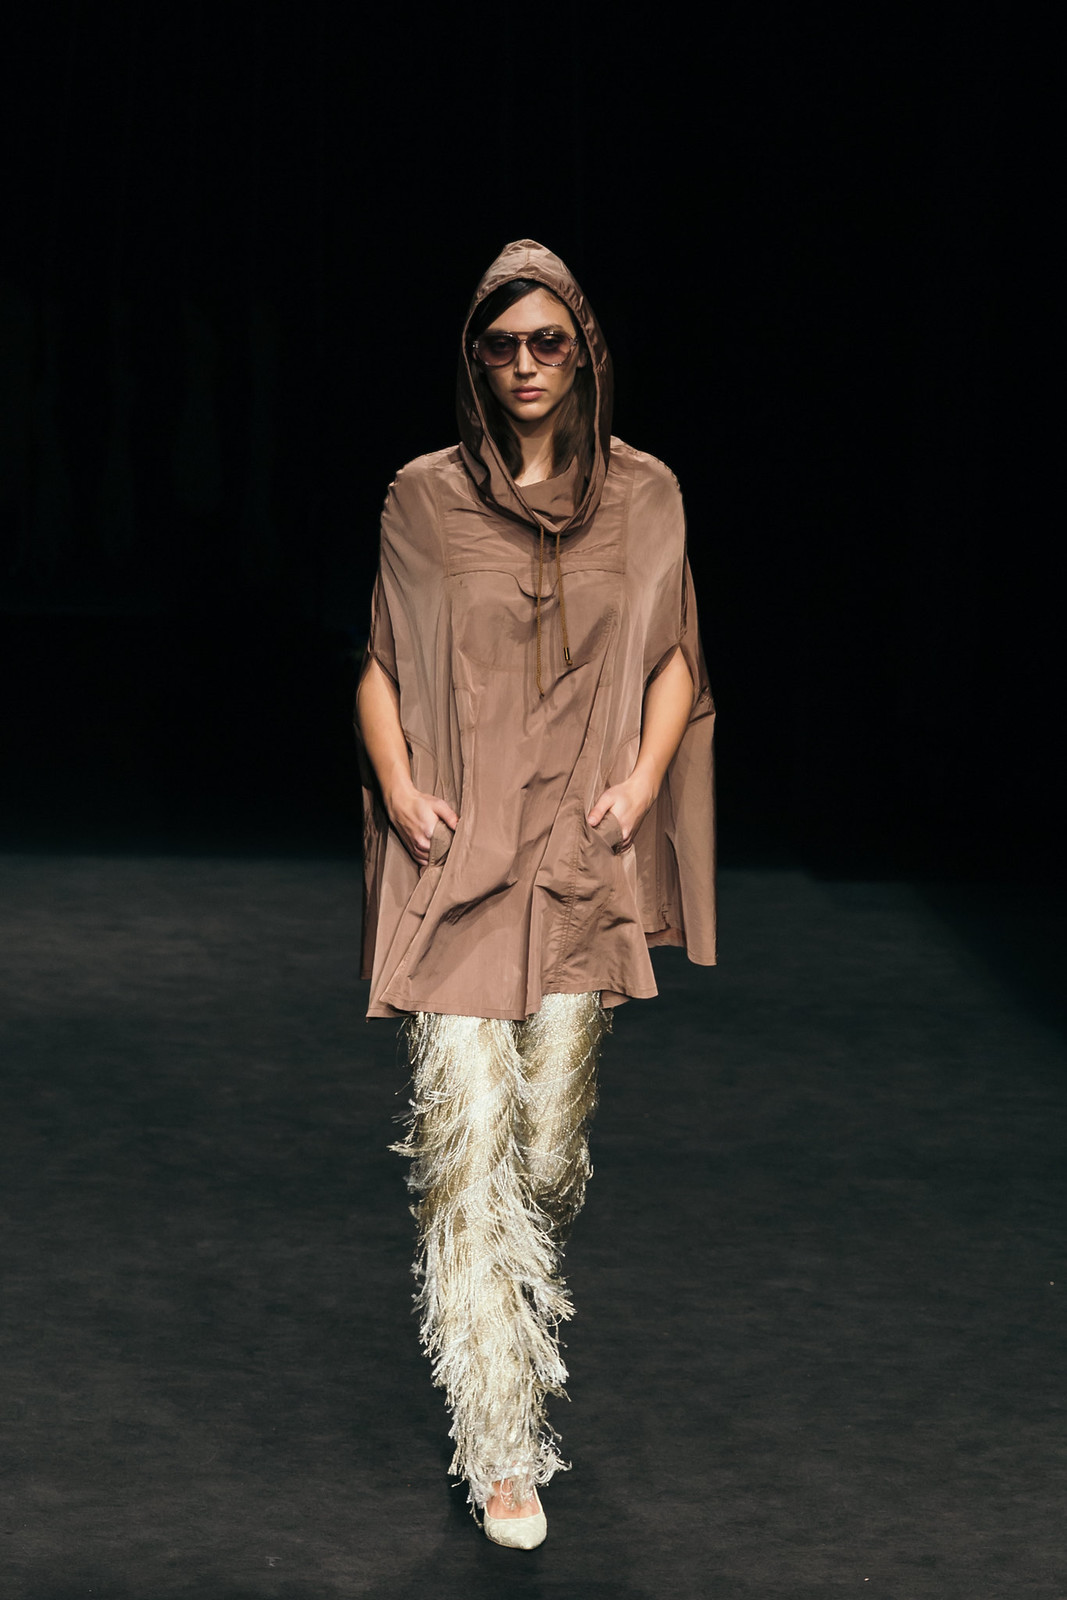 Jessie Chanes - Seams for a desire - 080 Bacelona Fashion #080bcnfasion -19